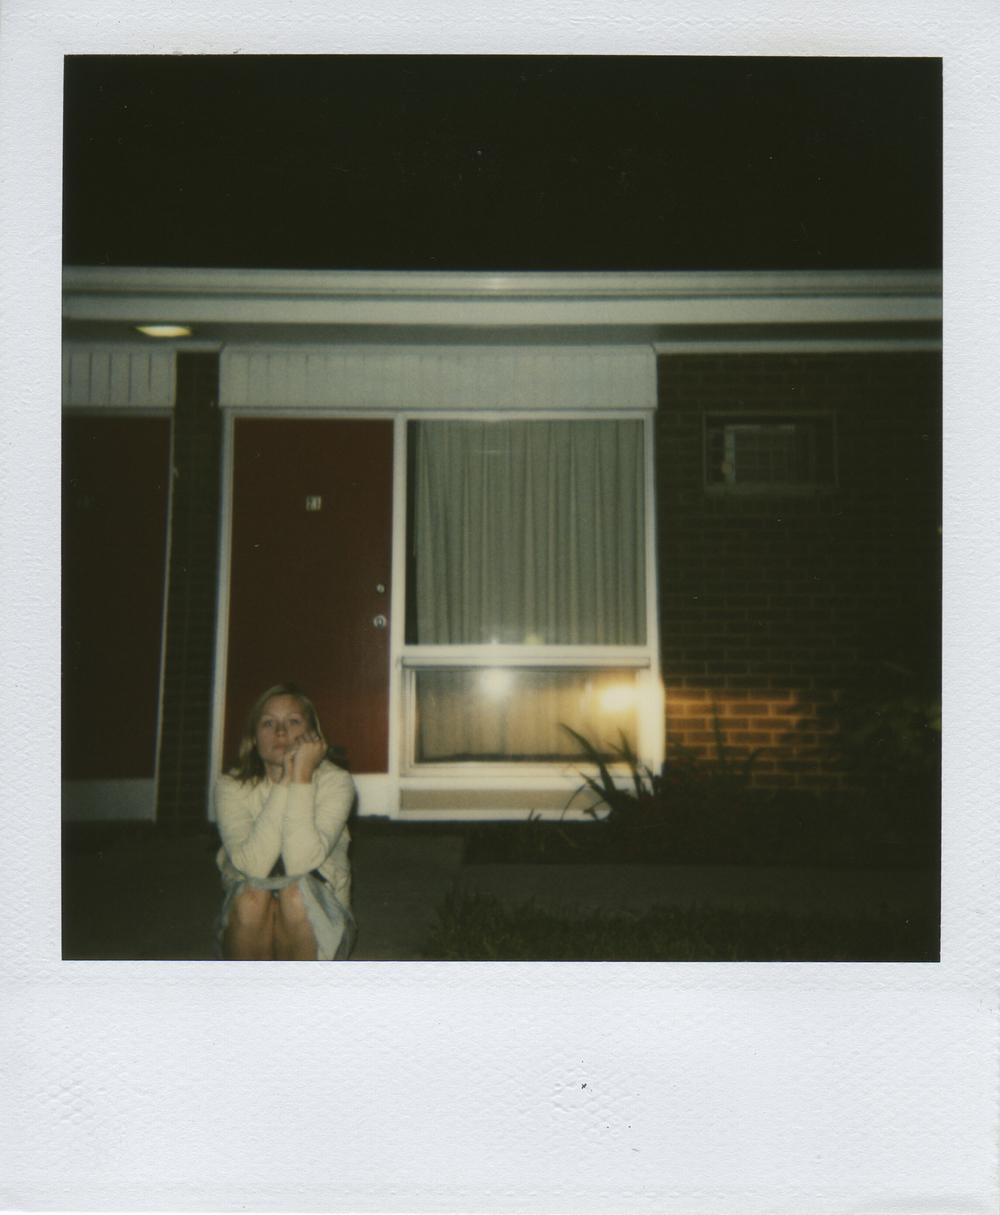 jlaurence-polaroid-049.jpg